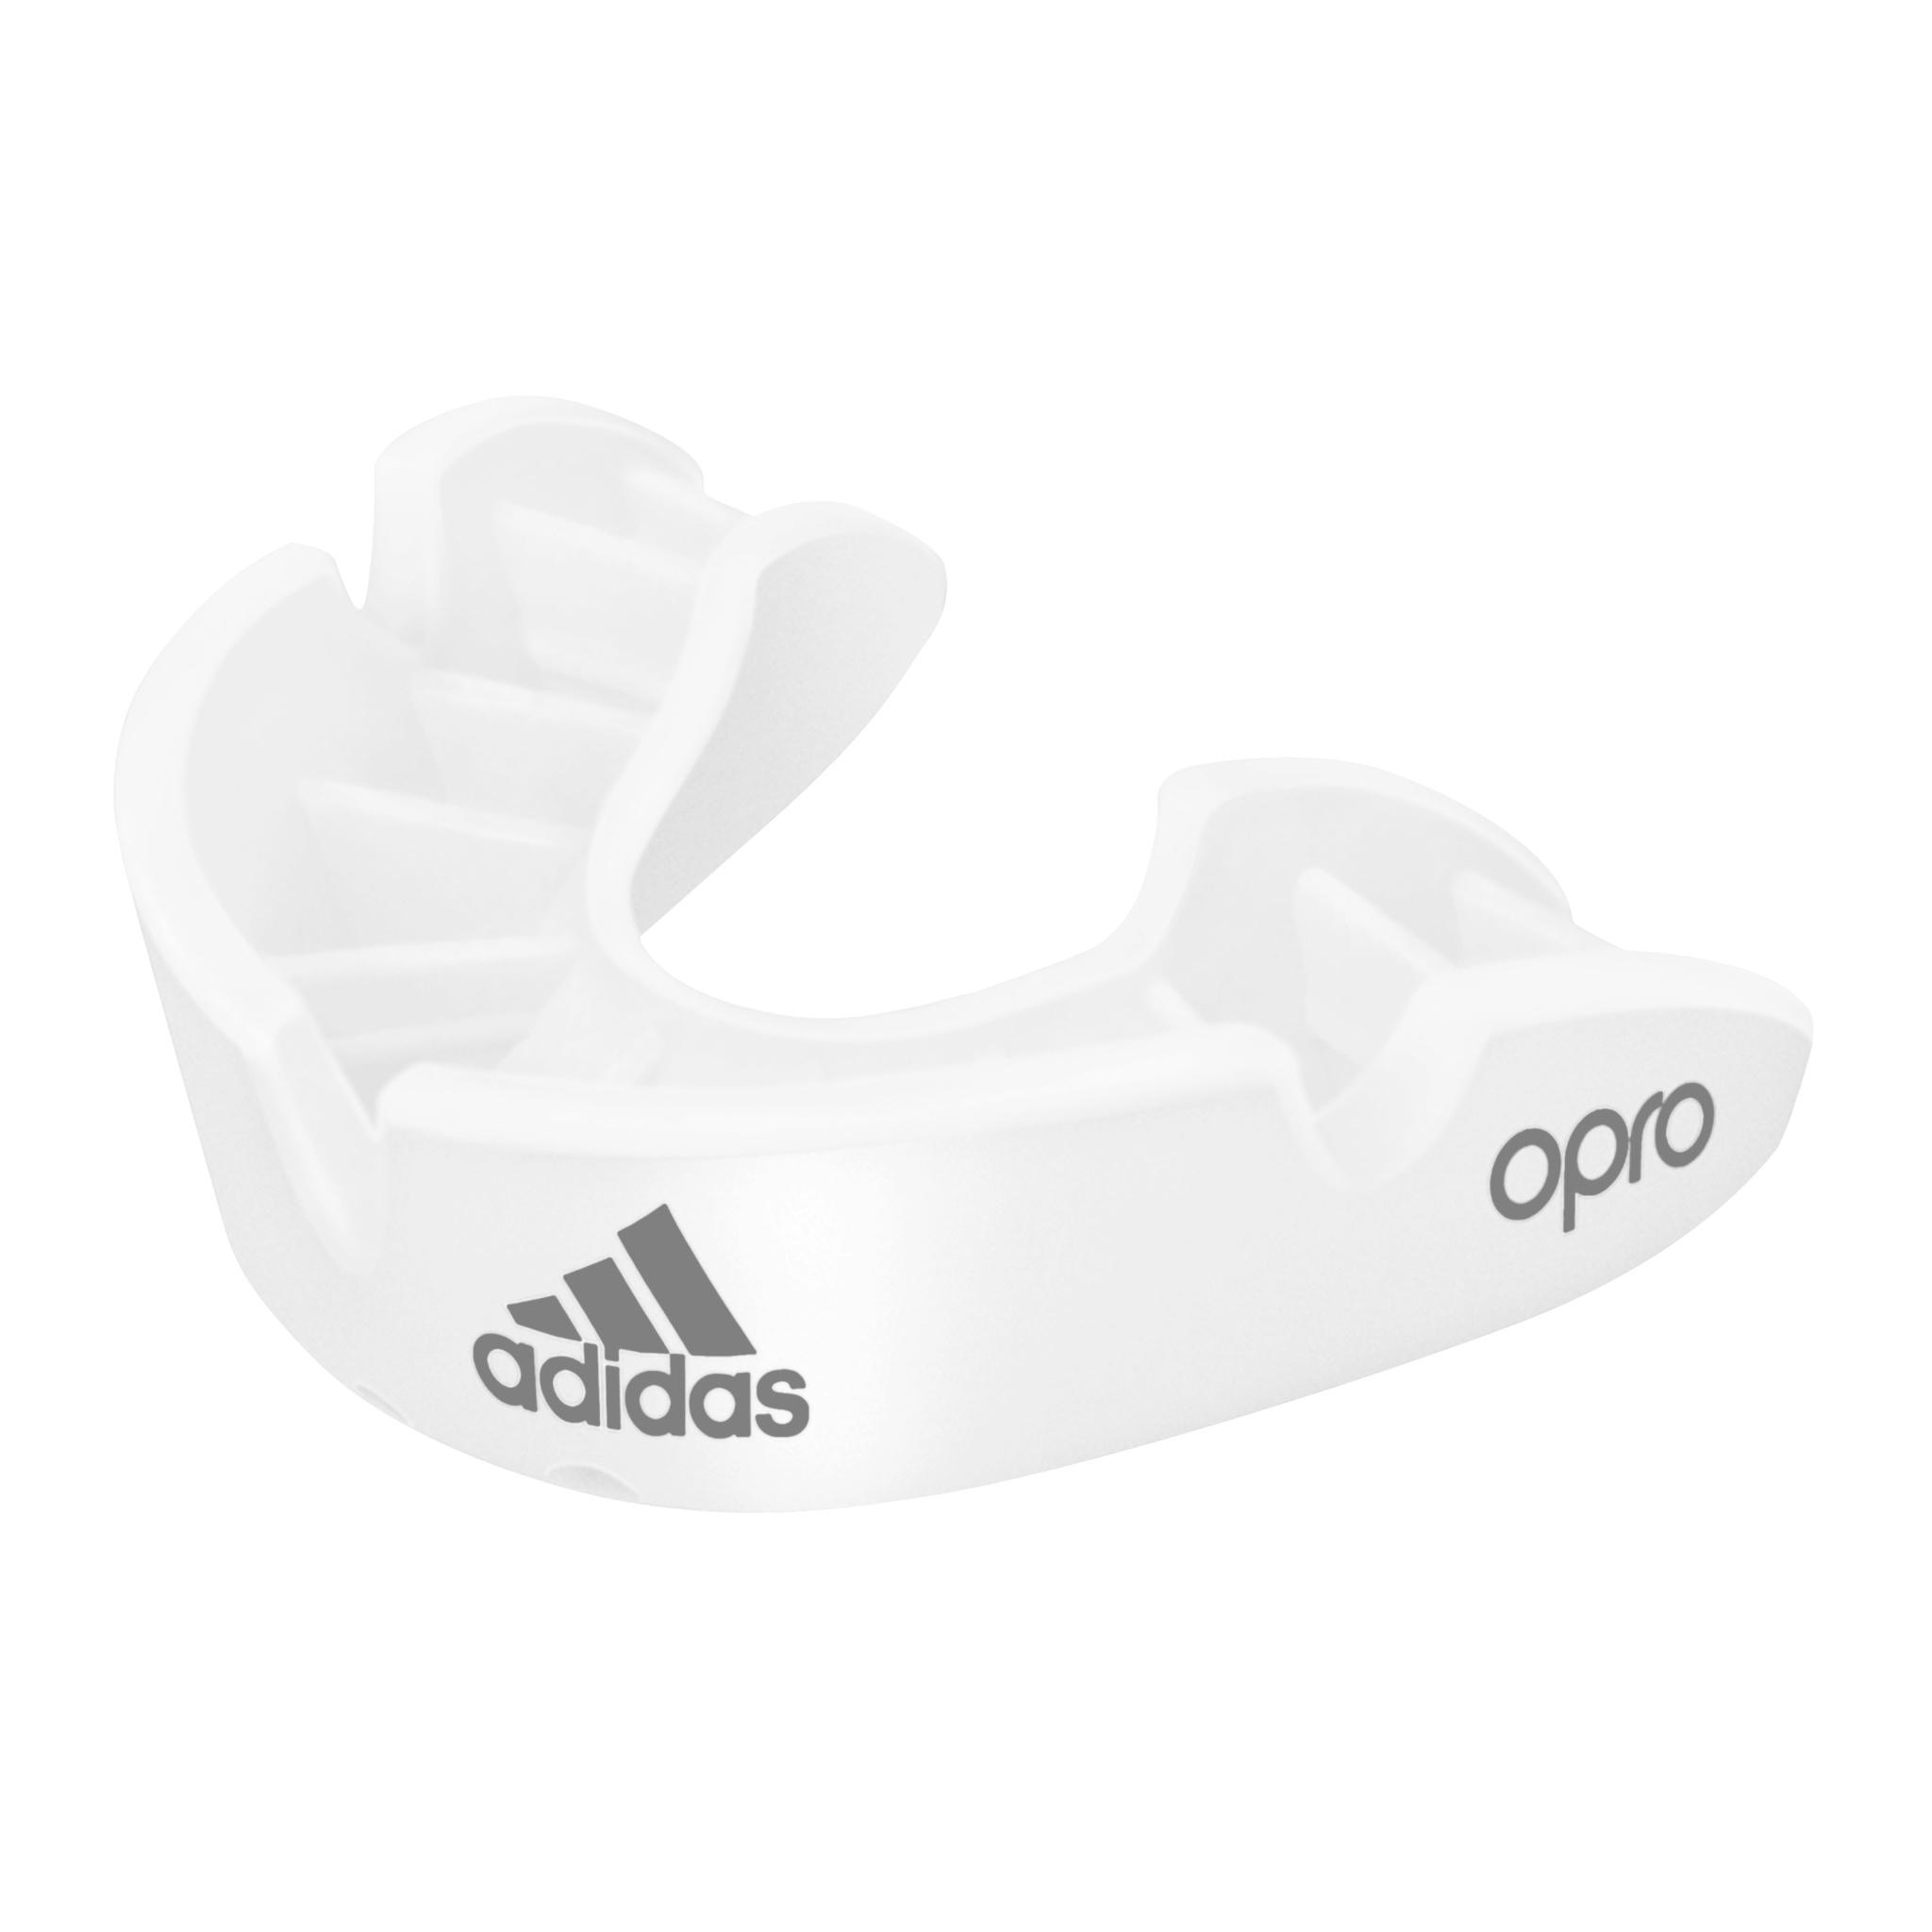 Adidas Adidas mouthguard brons  junior wit